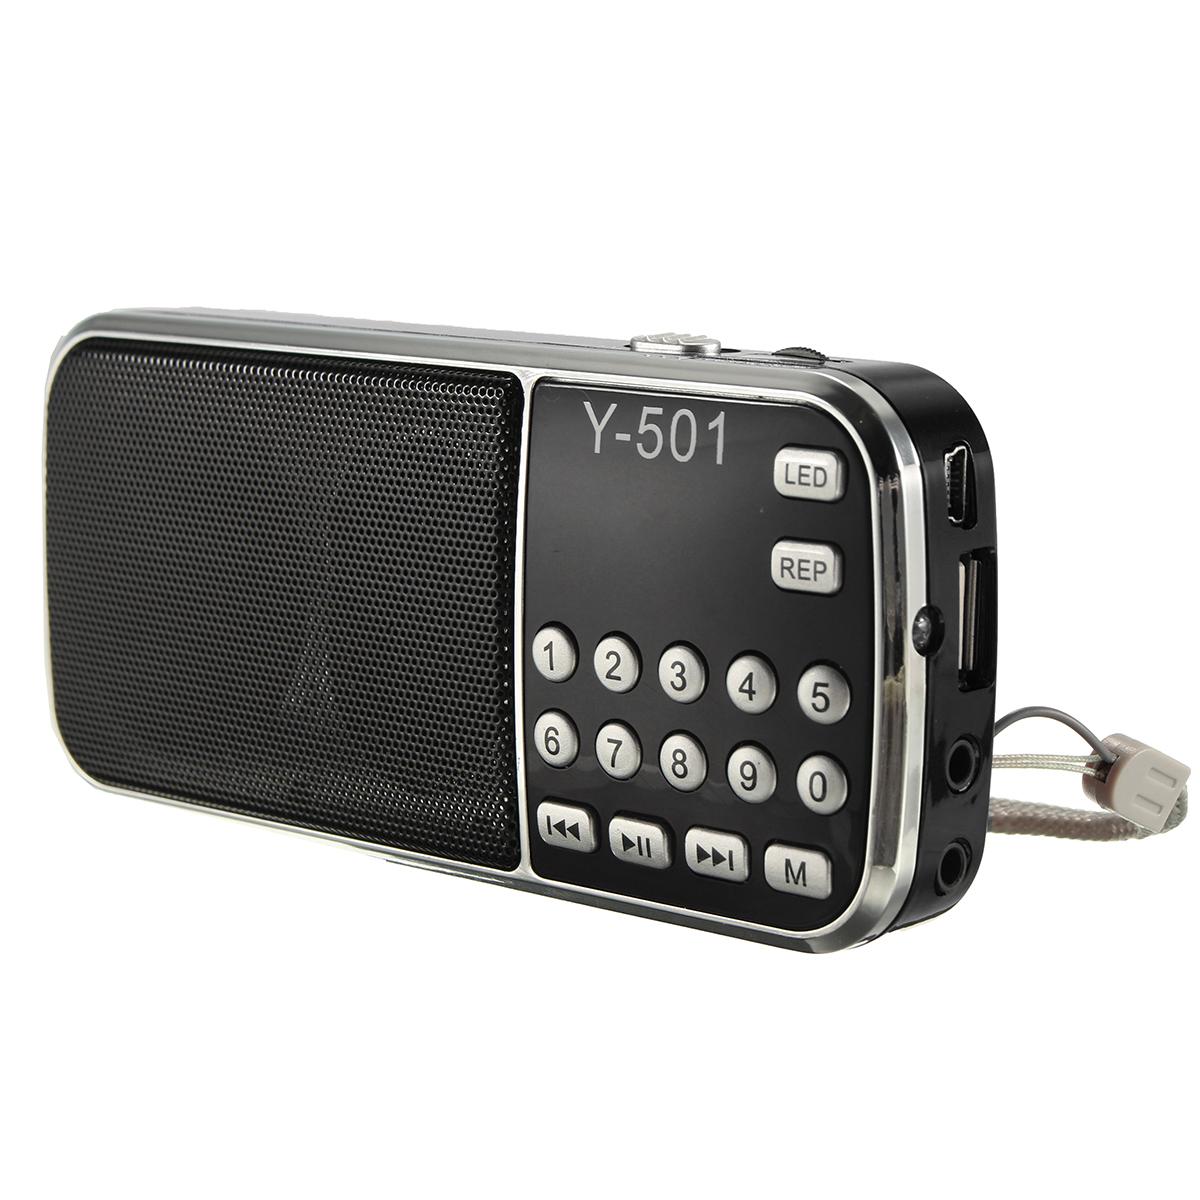 rechargeable mini lcd digital fm radio speaker usb tf card. Black Bedroom Furniture Sets. Home Design Ideas